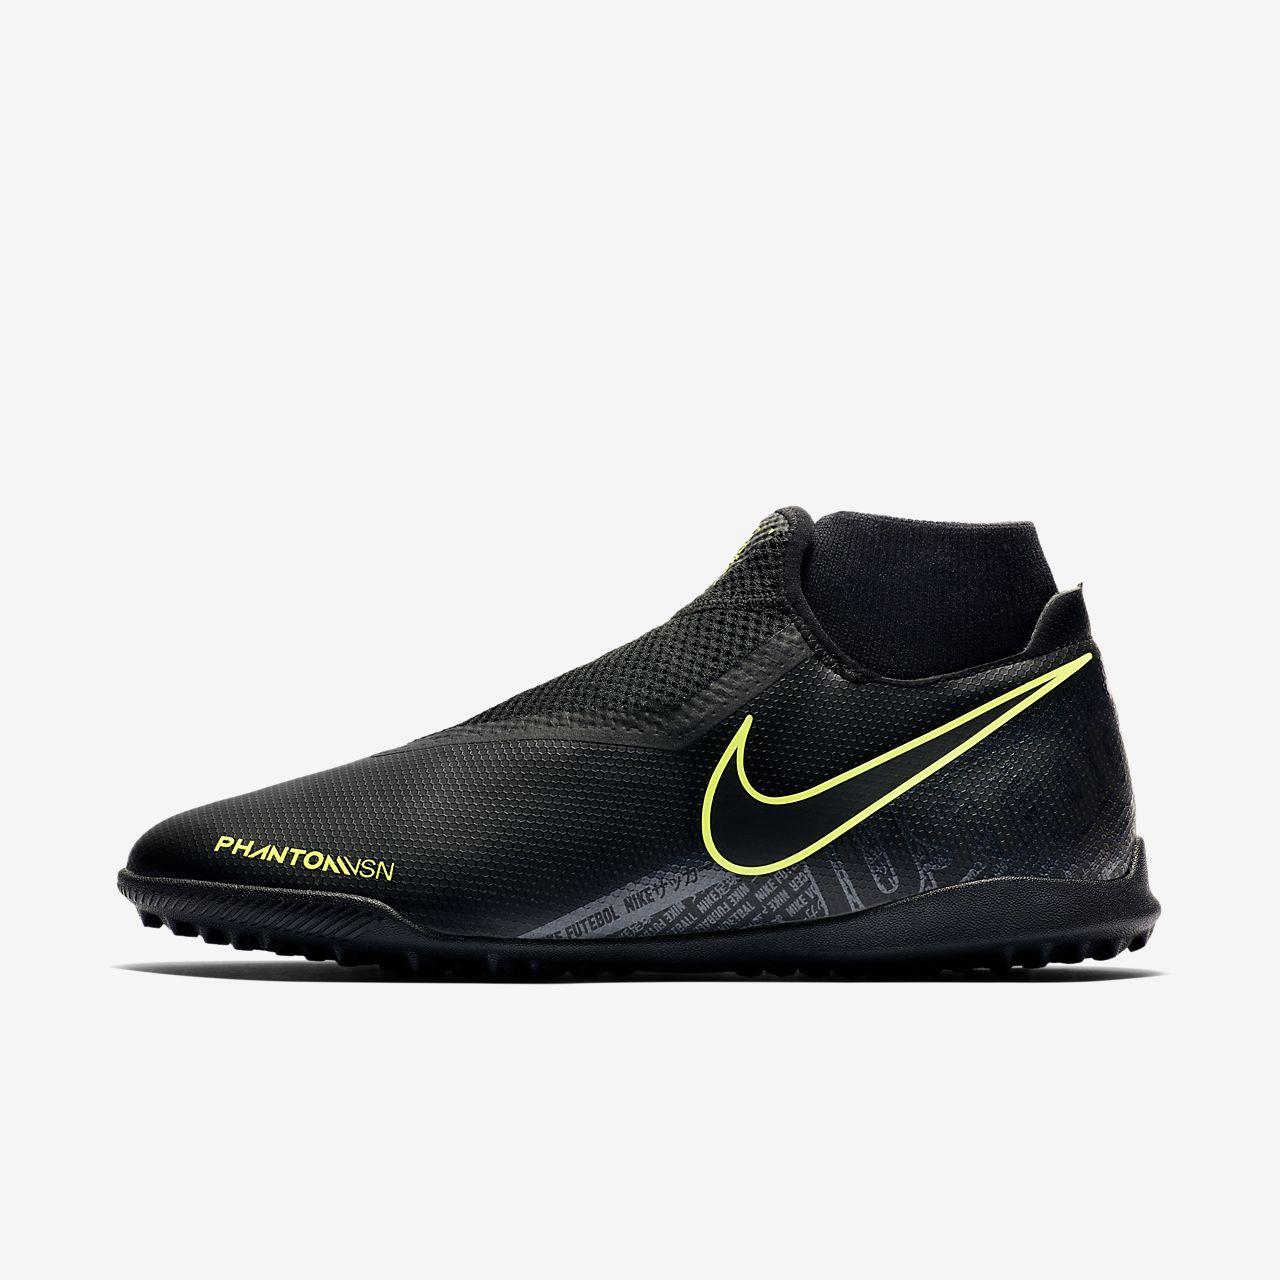 Fotbollssko Nike Phantom Vision Academy Dynamic Fit TF för grus/turf